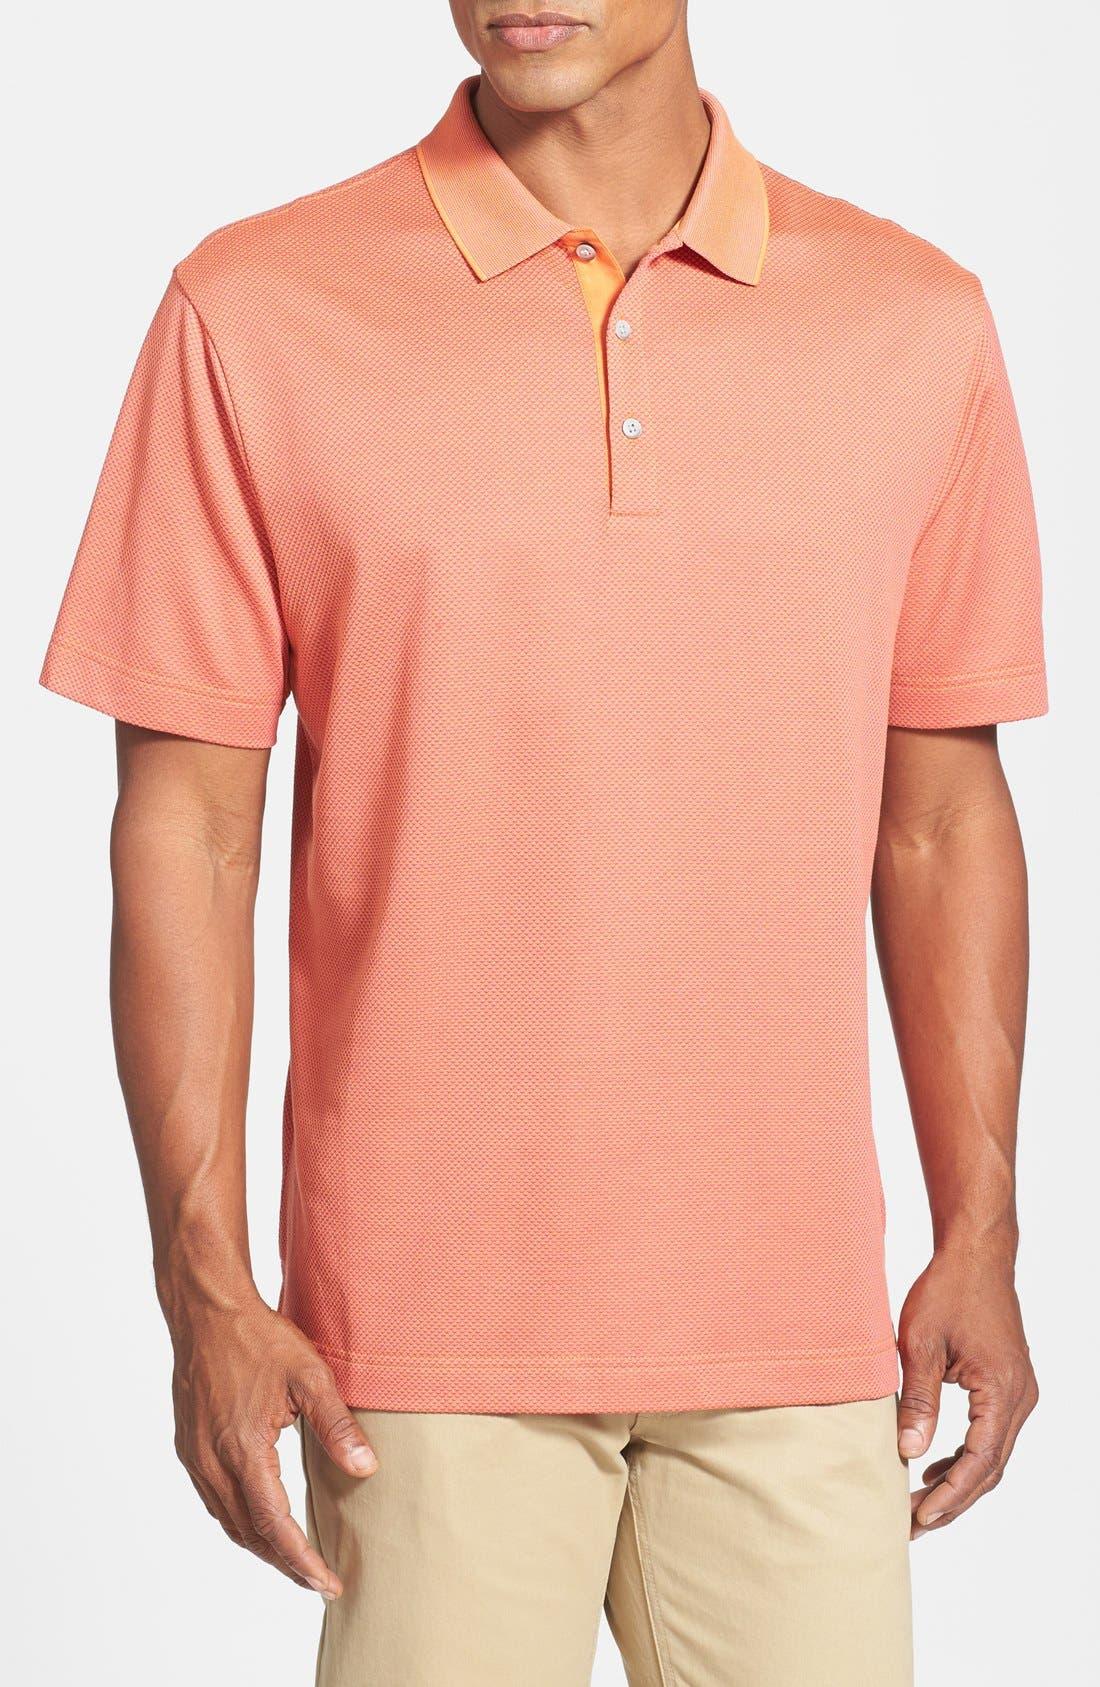 Alternate Image 1 Selected - Cutter & Buck 'Nano' Wrinkle Free DryTec Golf Polo